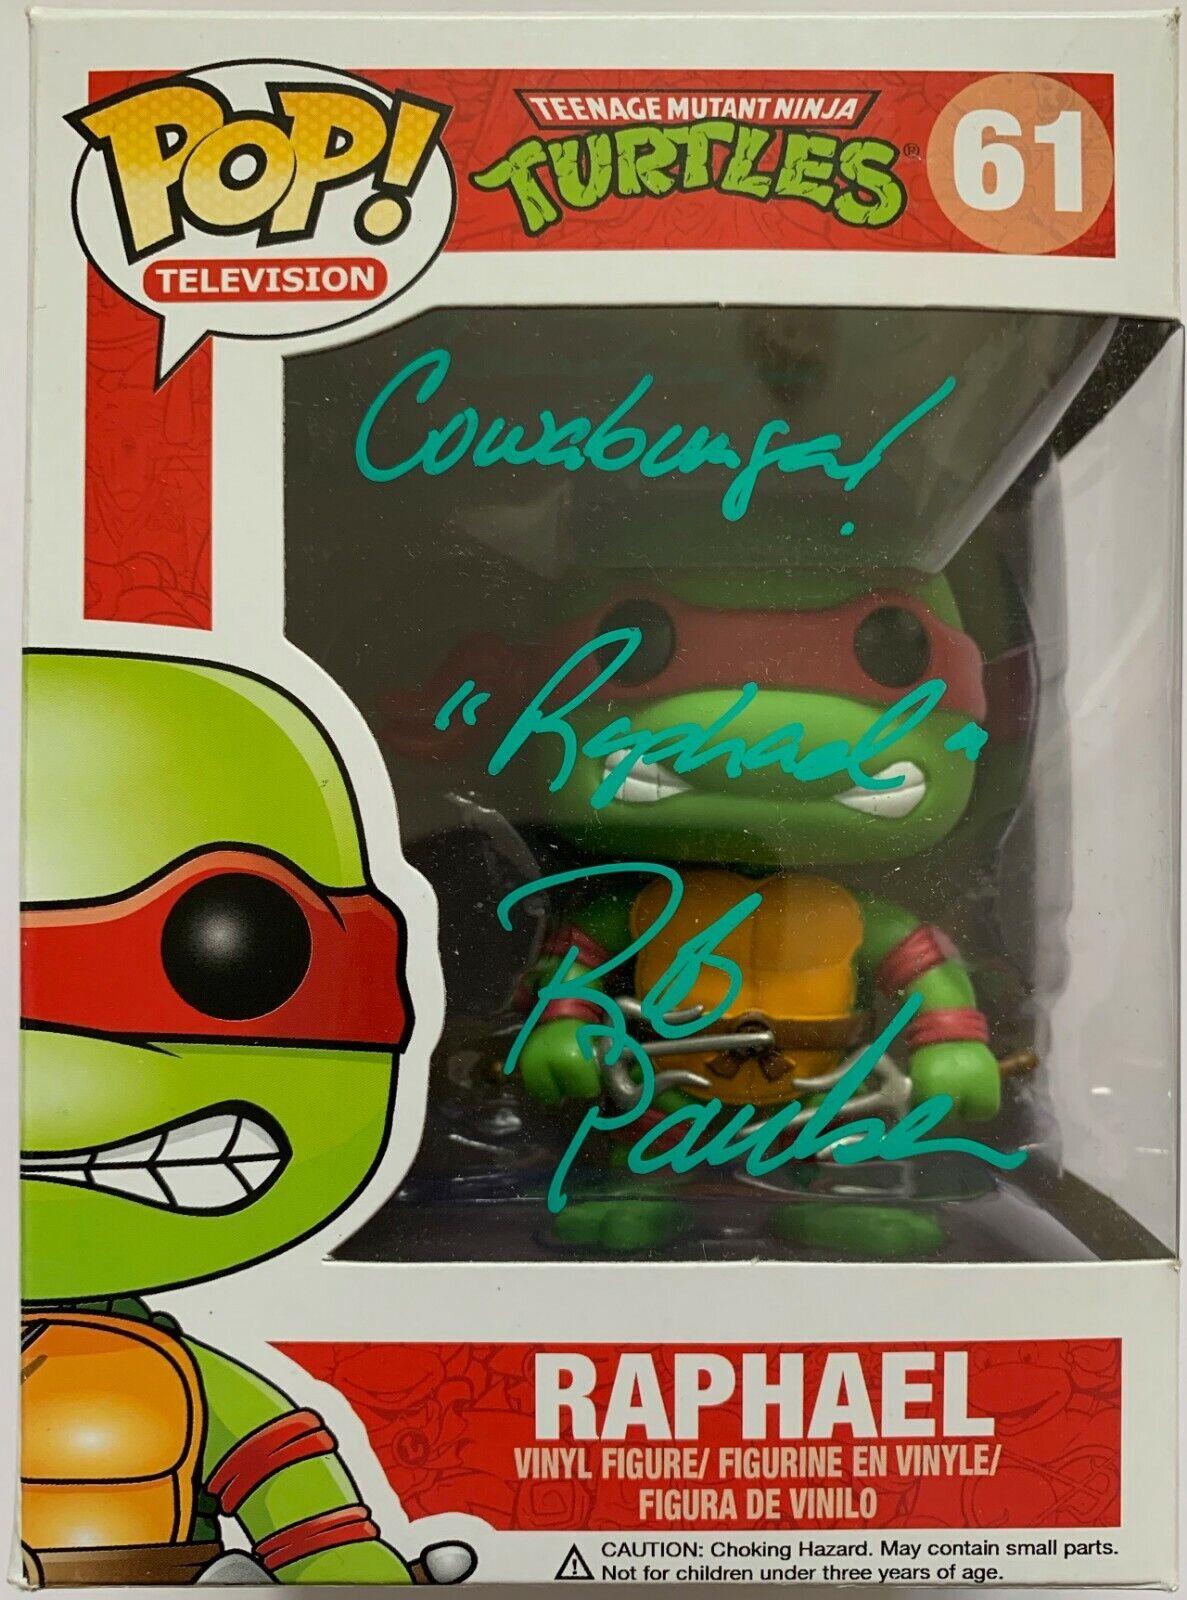 Rob PAULSEN Firmato a uomoo divertiessitoko Pop Tartarughe NinjaRaffaello.